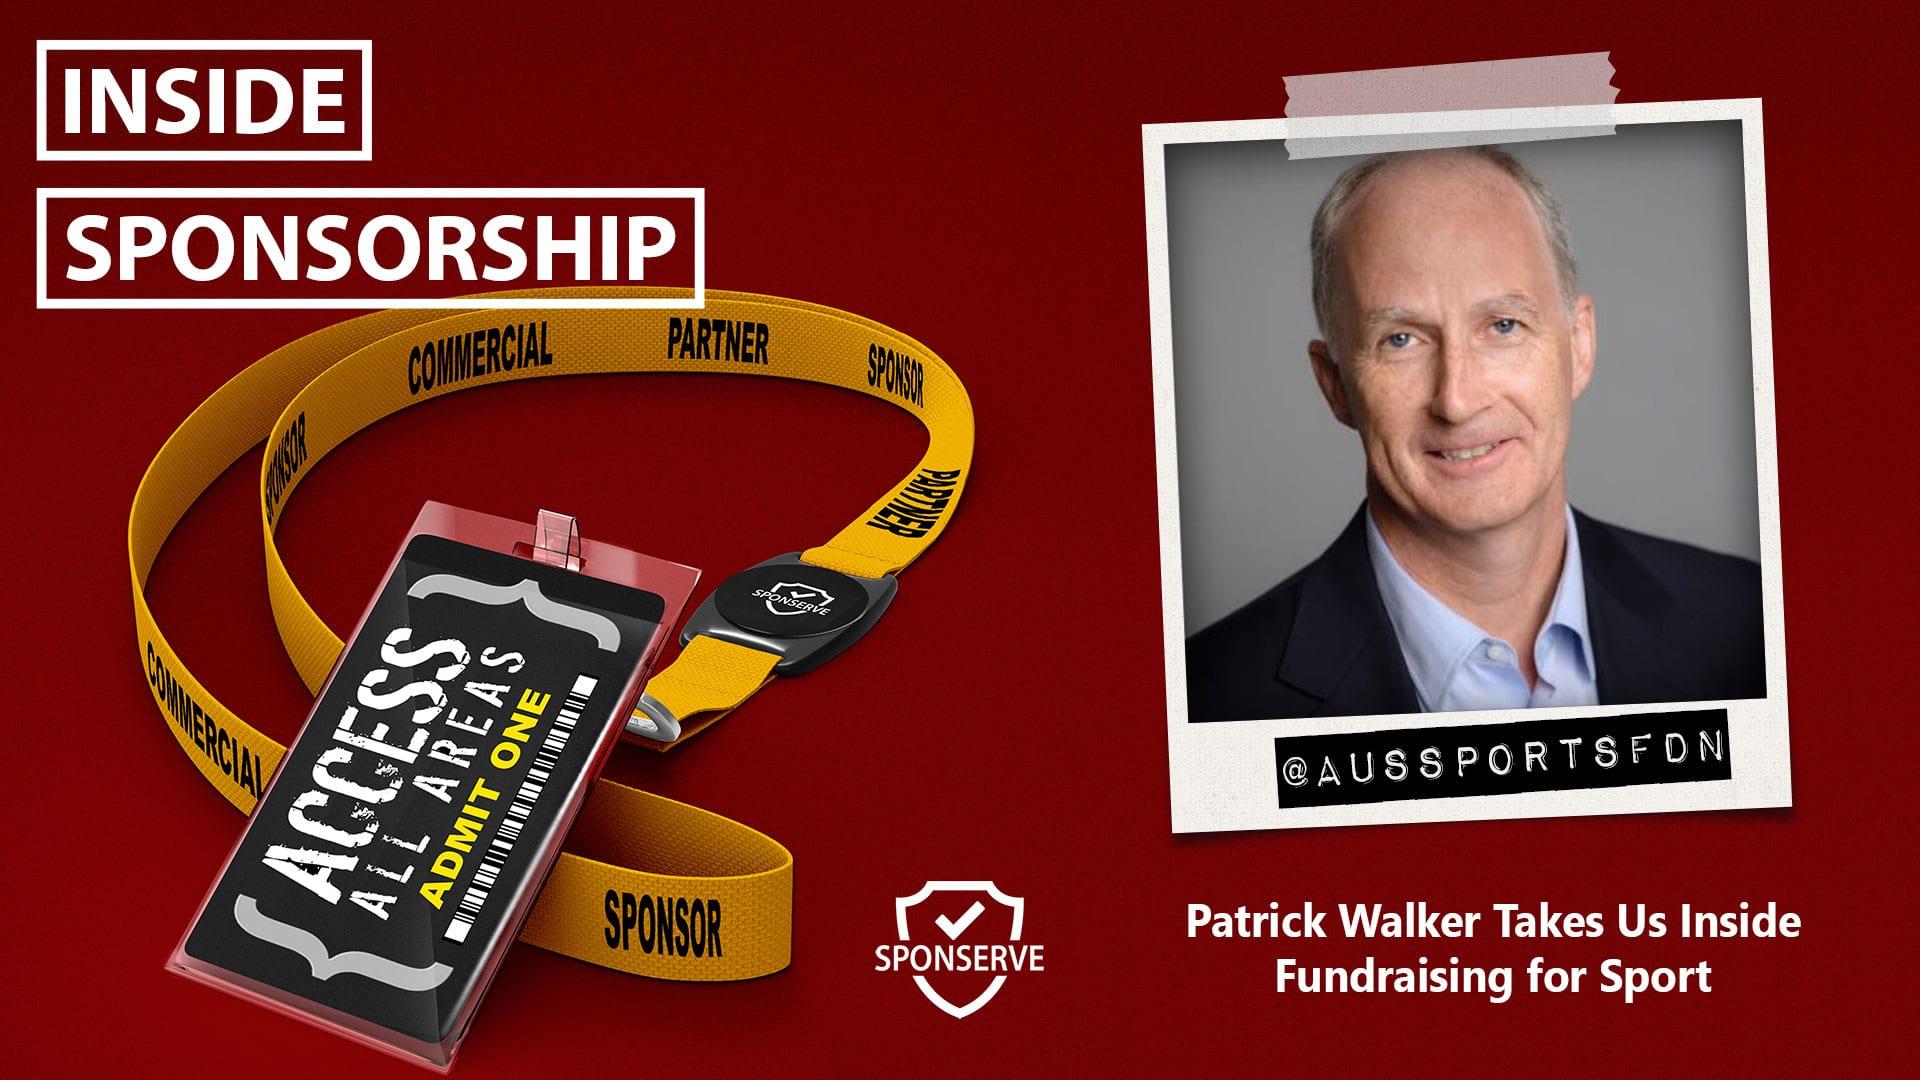 inside-sponsorship-patrick-walker-fundraising-sport